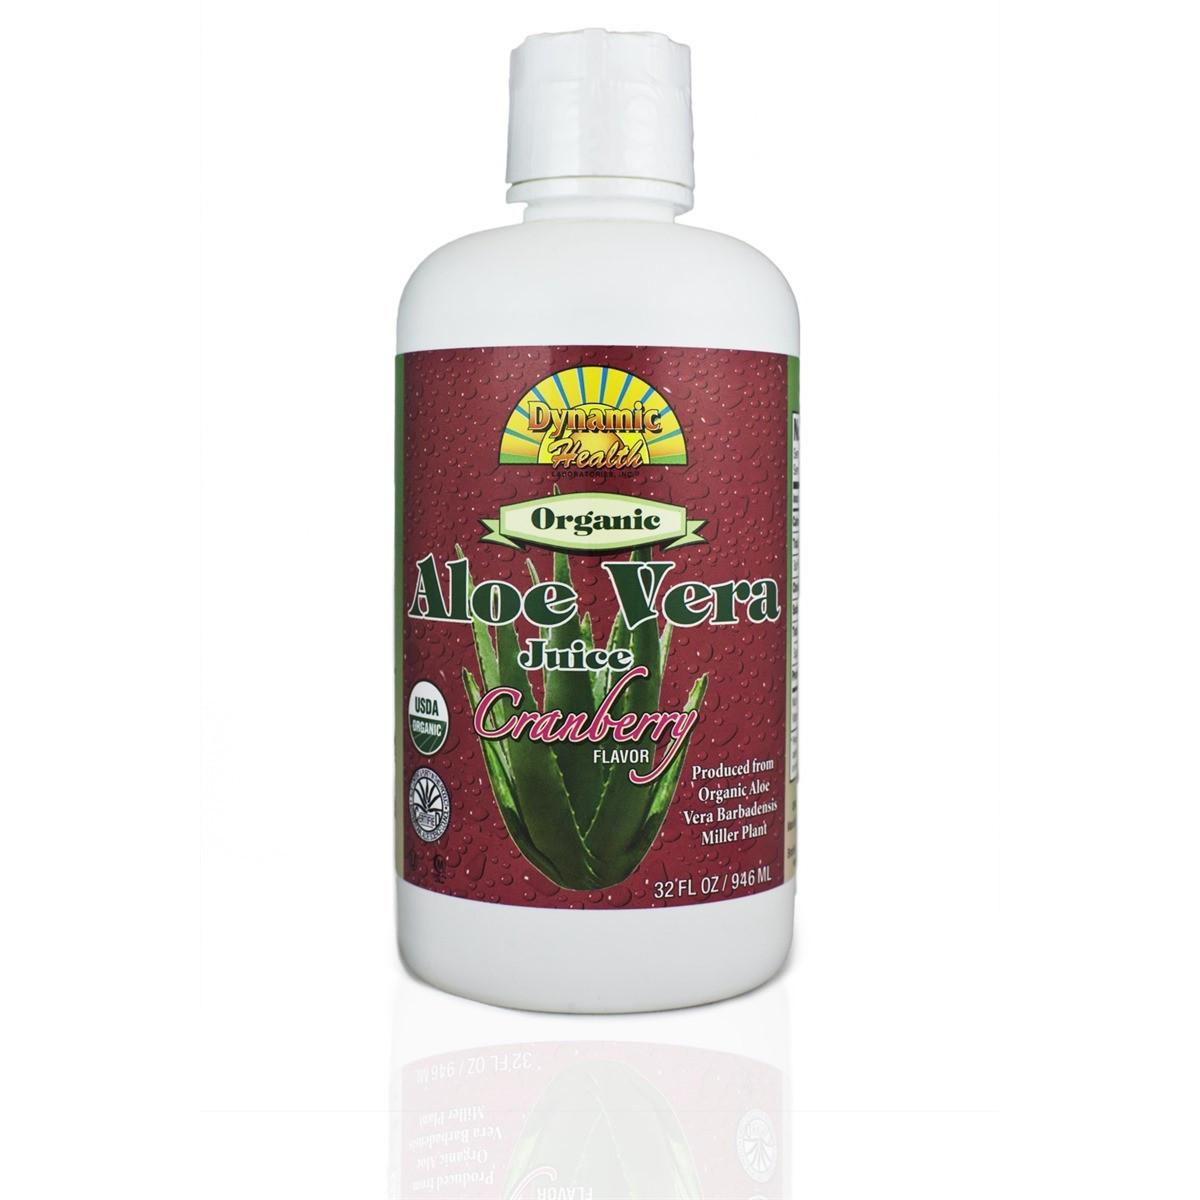 Organic Aloe Vera Juice  Aloe Vera Aloe Vera Juice Aloe Juice